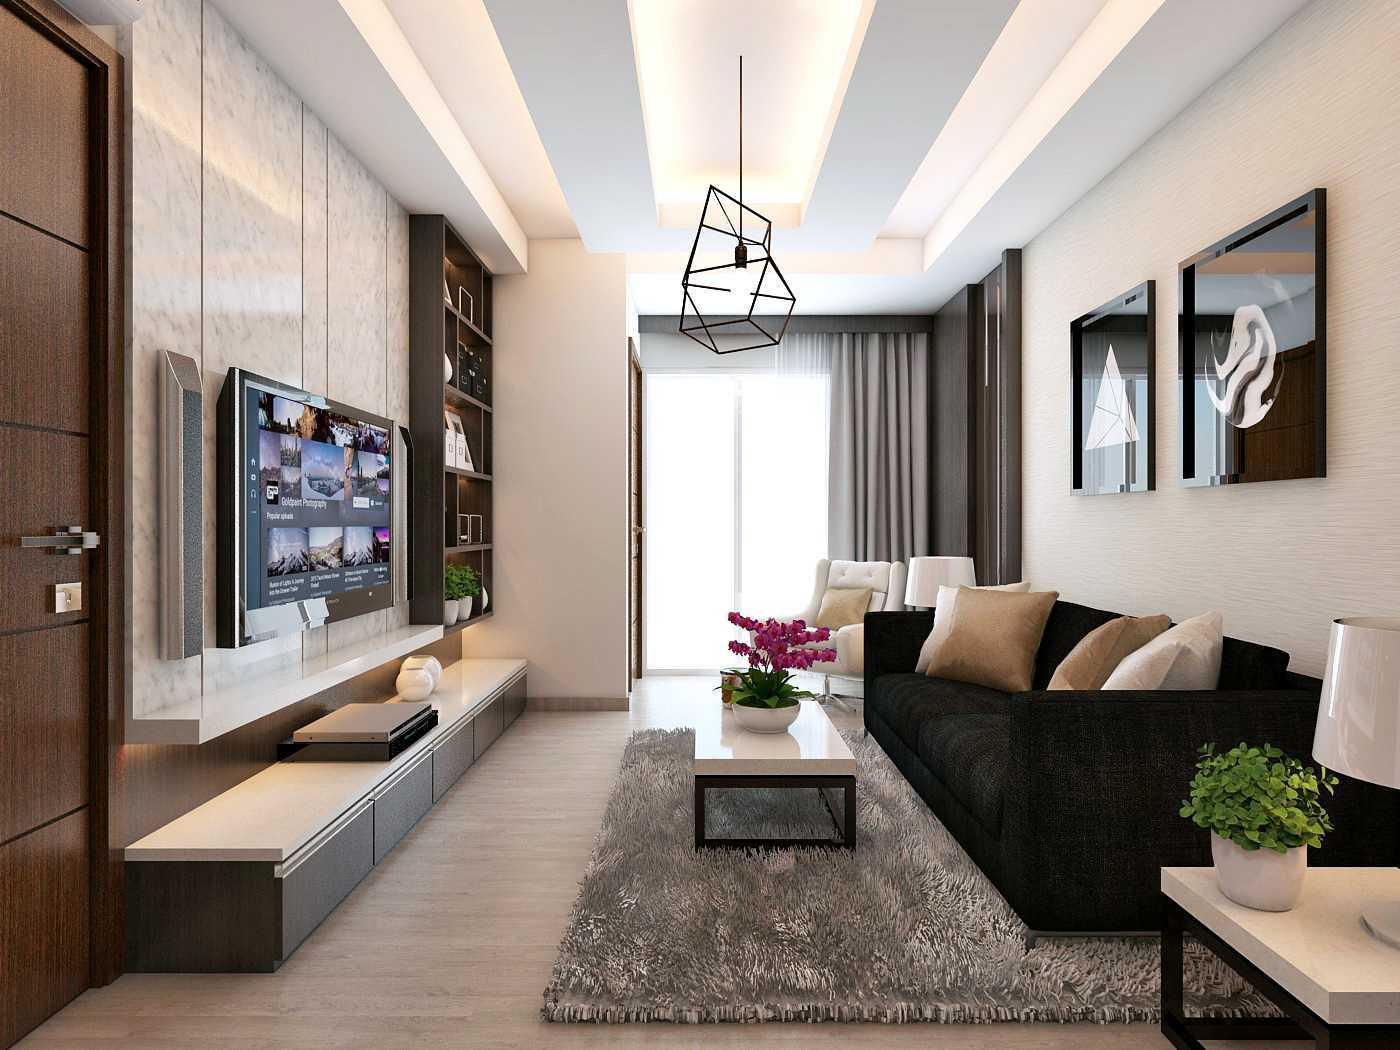 Habibullah Alfatih Condominium - Greenbay Pluit Jakarta, Indonesia Jakarta, Indonesia R-Keluarga-1 Kontemporer 35912